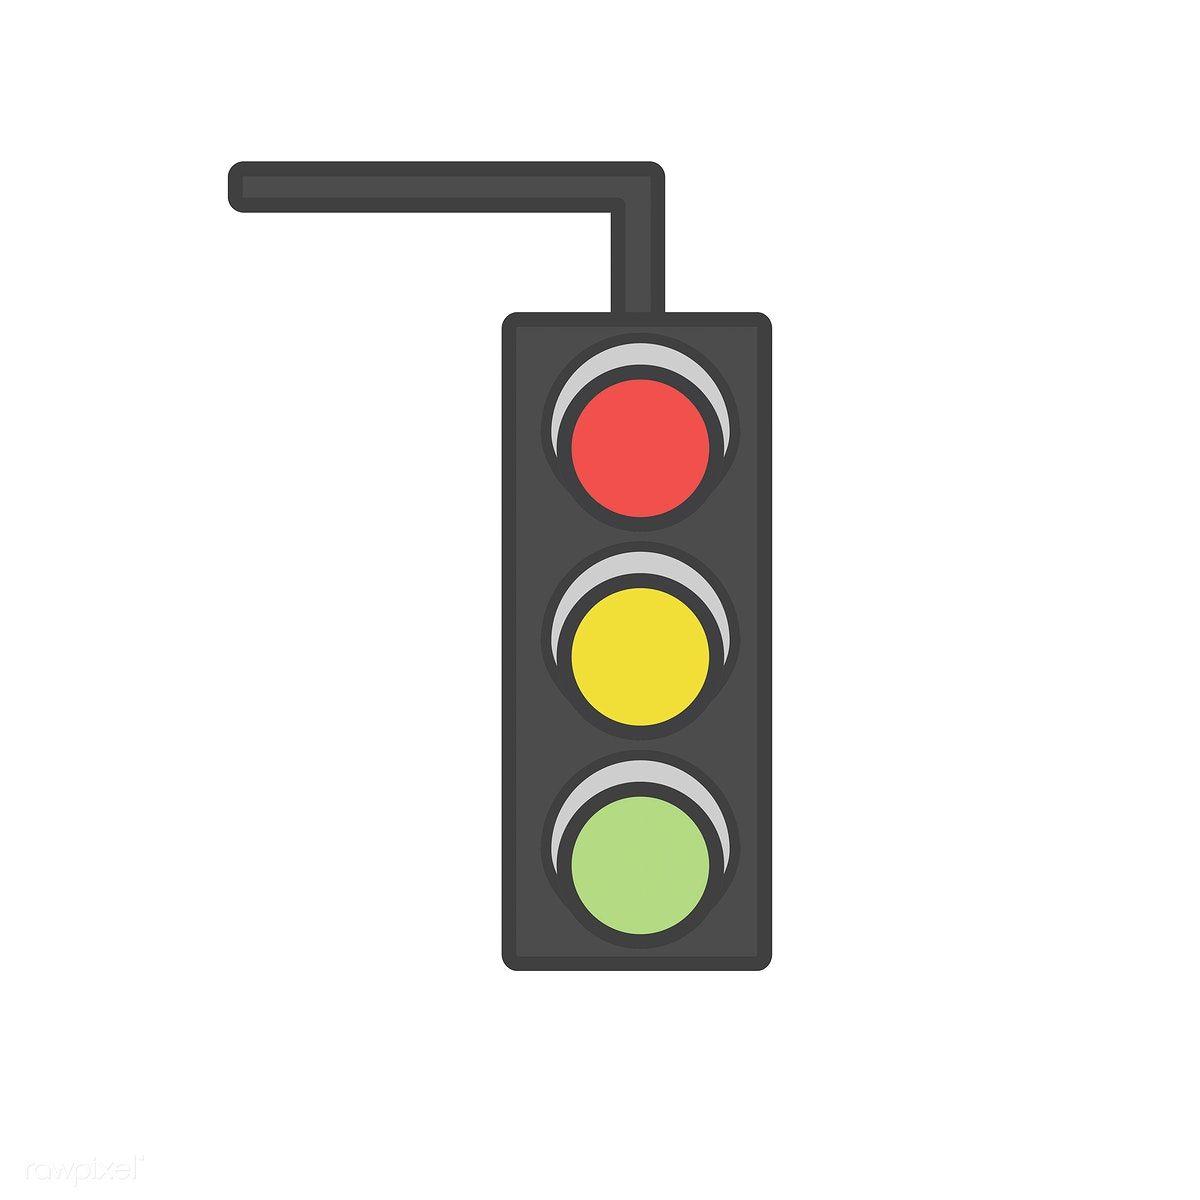 Illustration Of A Traffic Light Premium Image By Rawpixel Com Traffic Light Light Icon Illustration